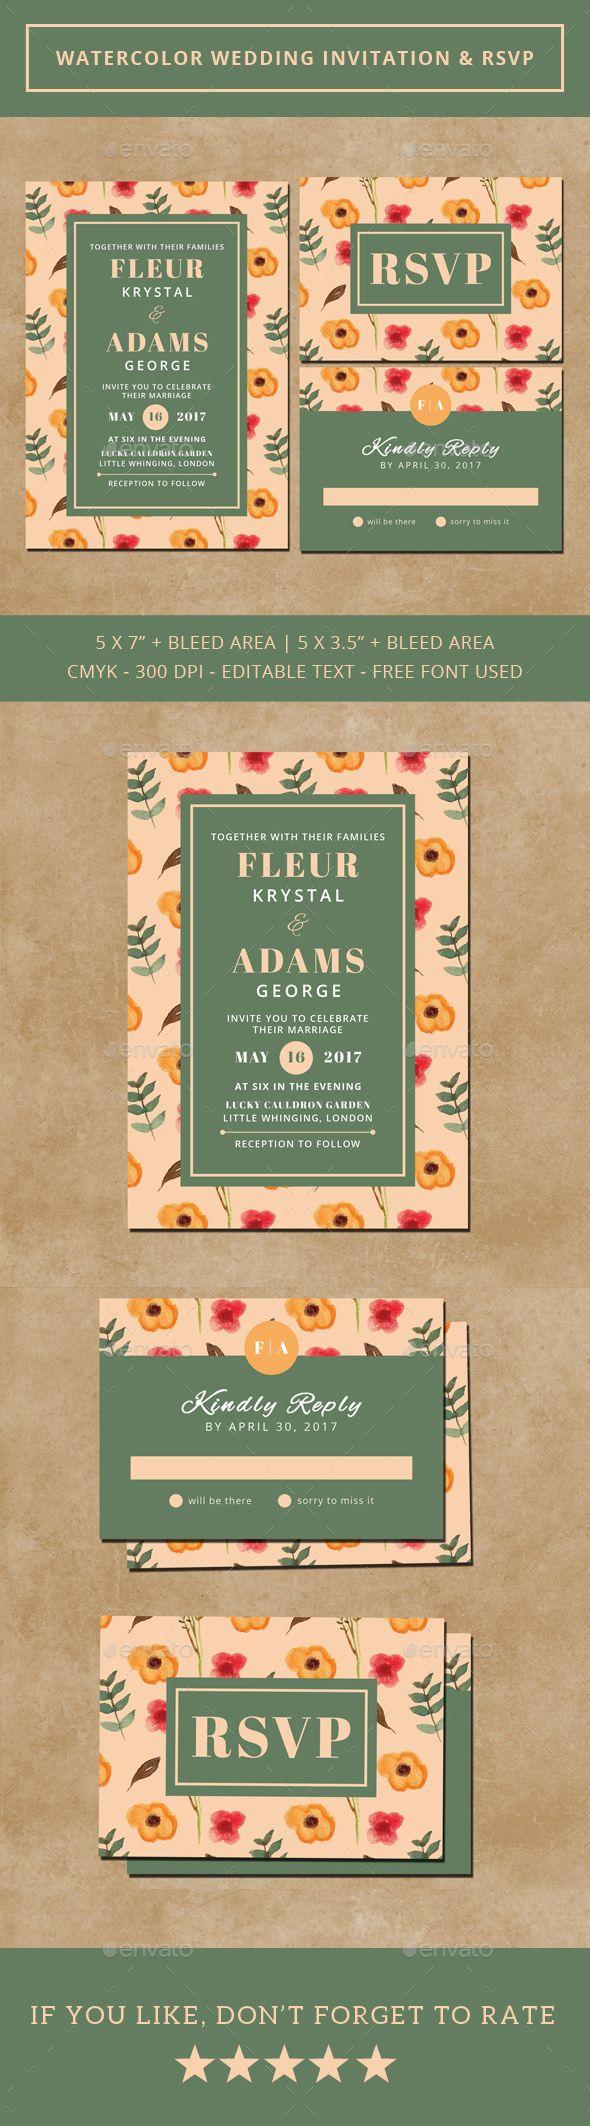 Watercolor Wedding Invitation Rsvp Template Invitation Card